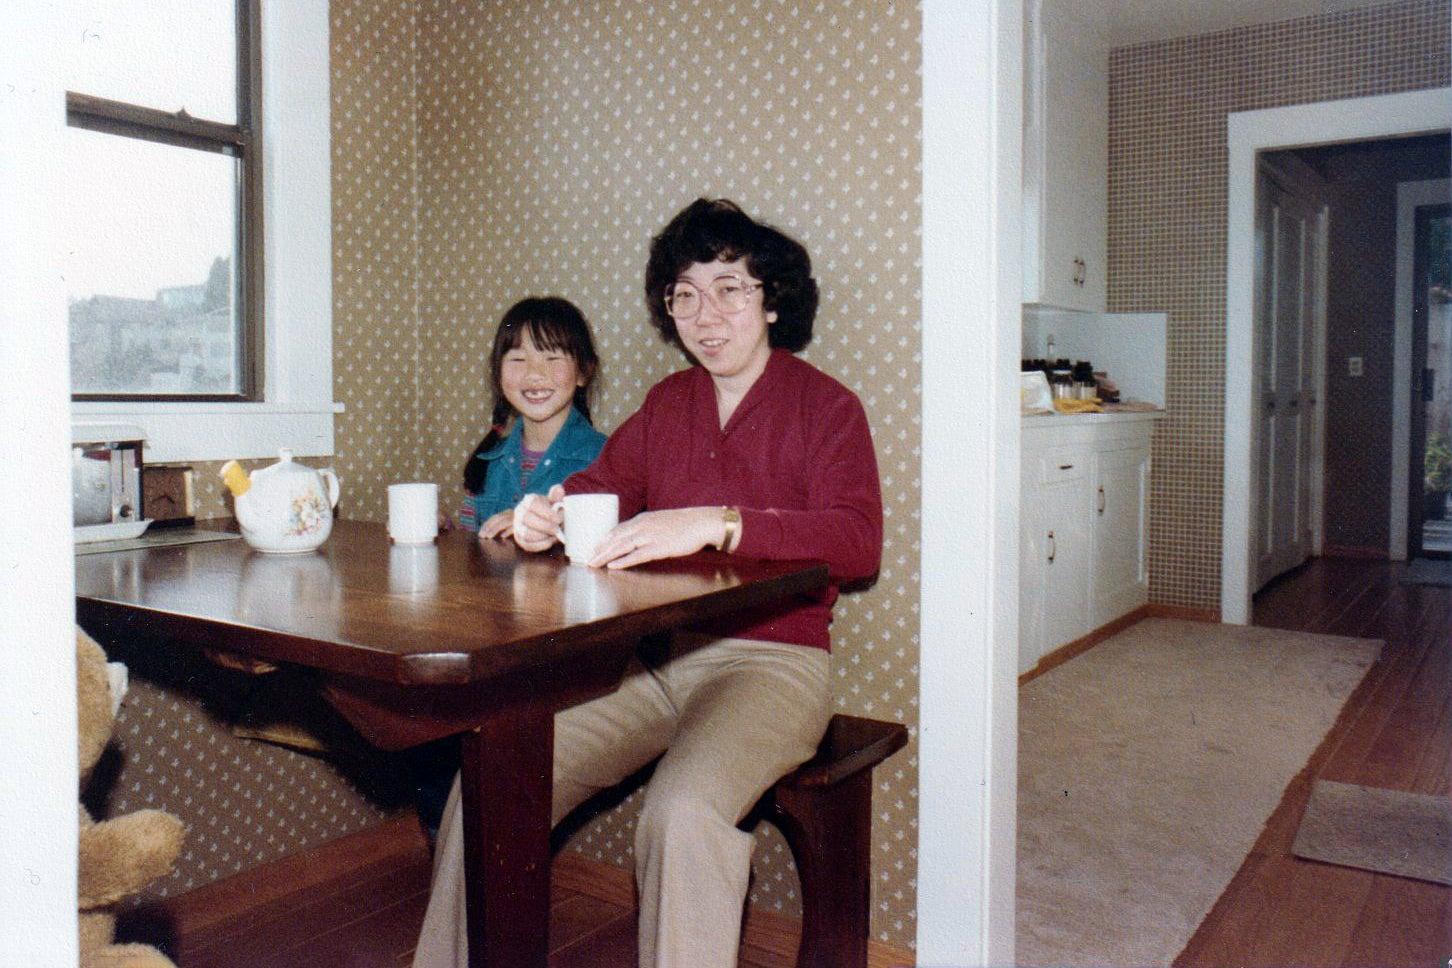 dining room corner, vintage photo